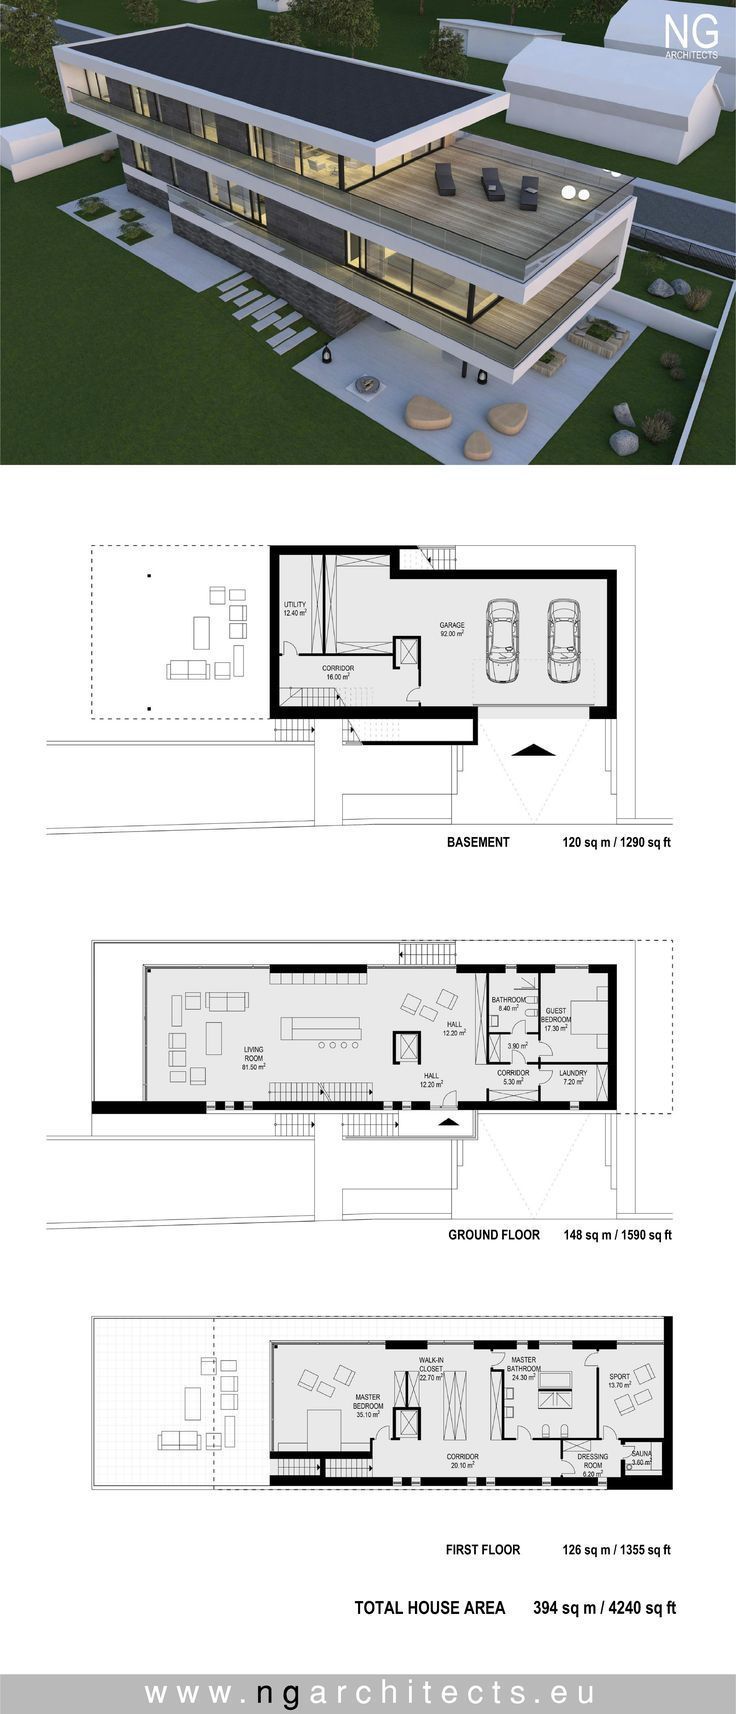 Plans Maison En Photos 2018 Image Description Modern Villa